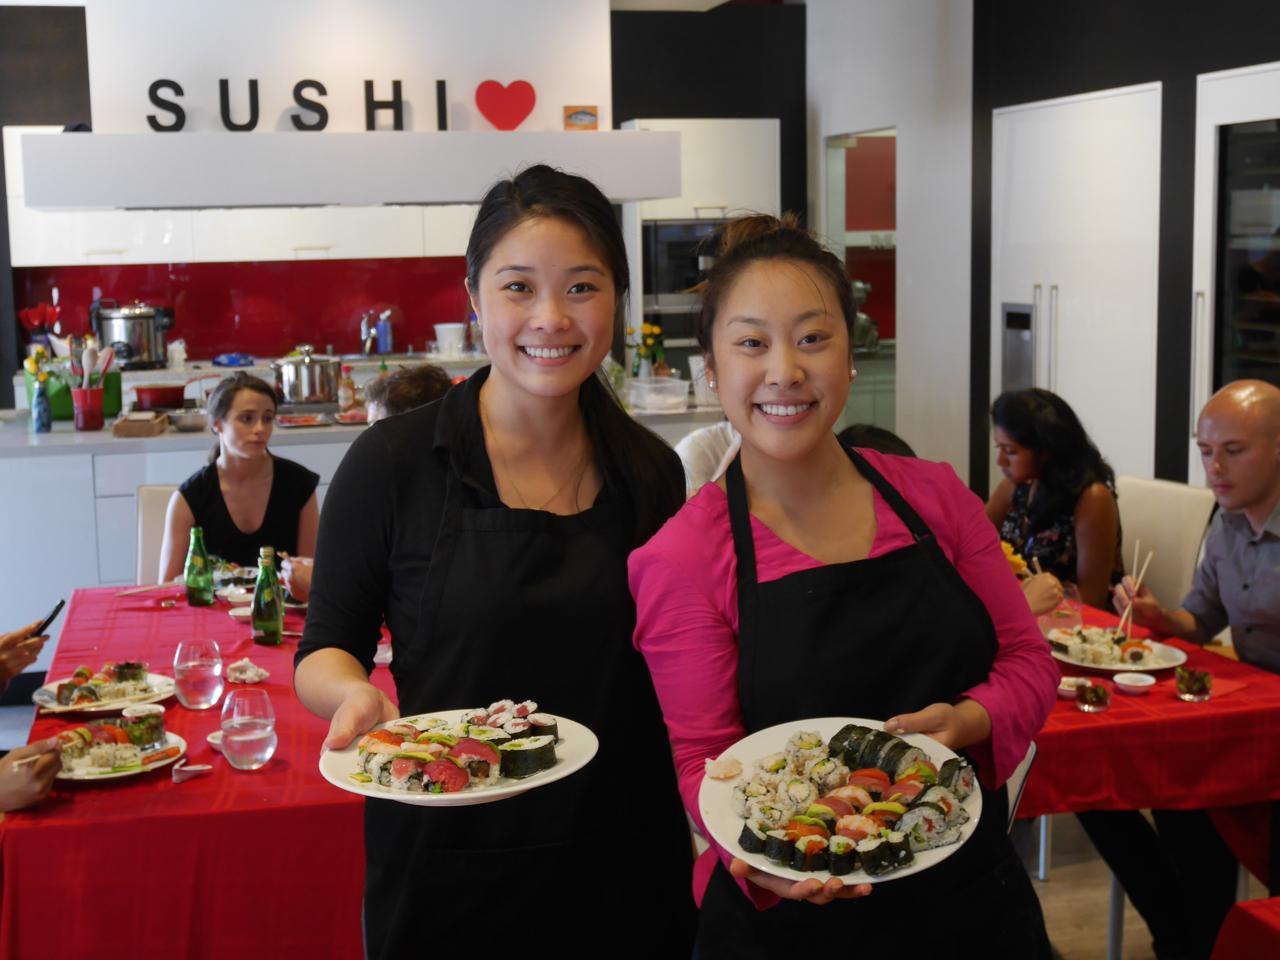 San Francisco  Sushi Class Cooking Class September 10, 2016 8